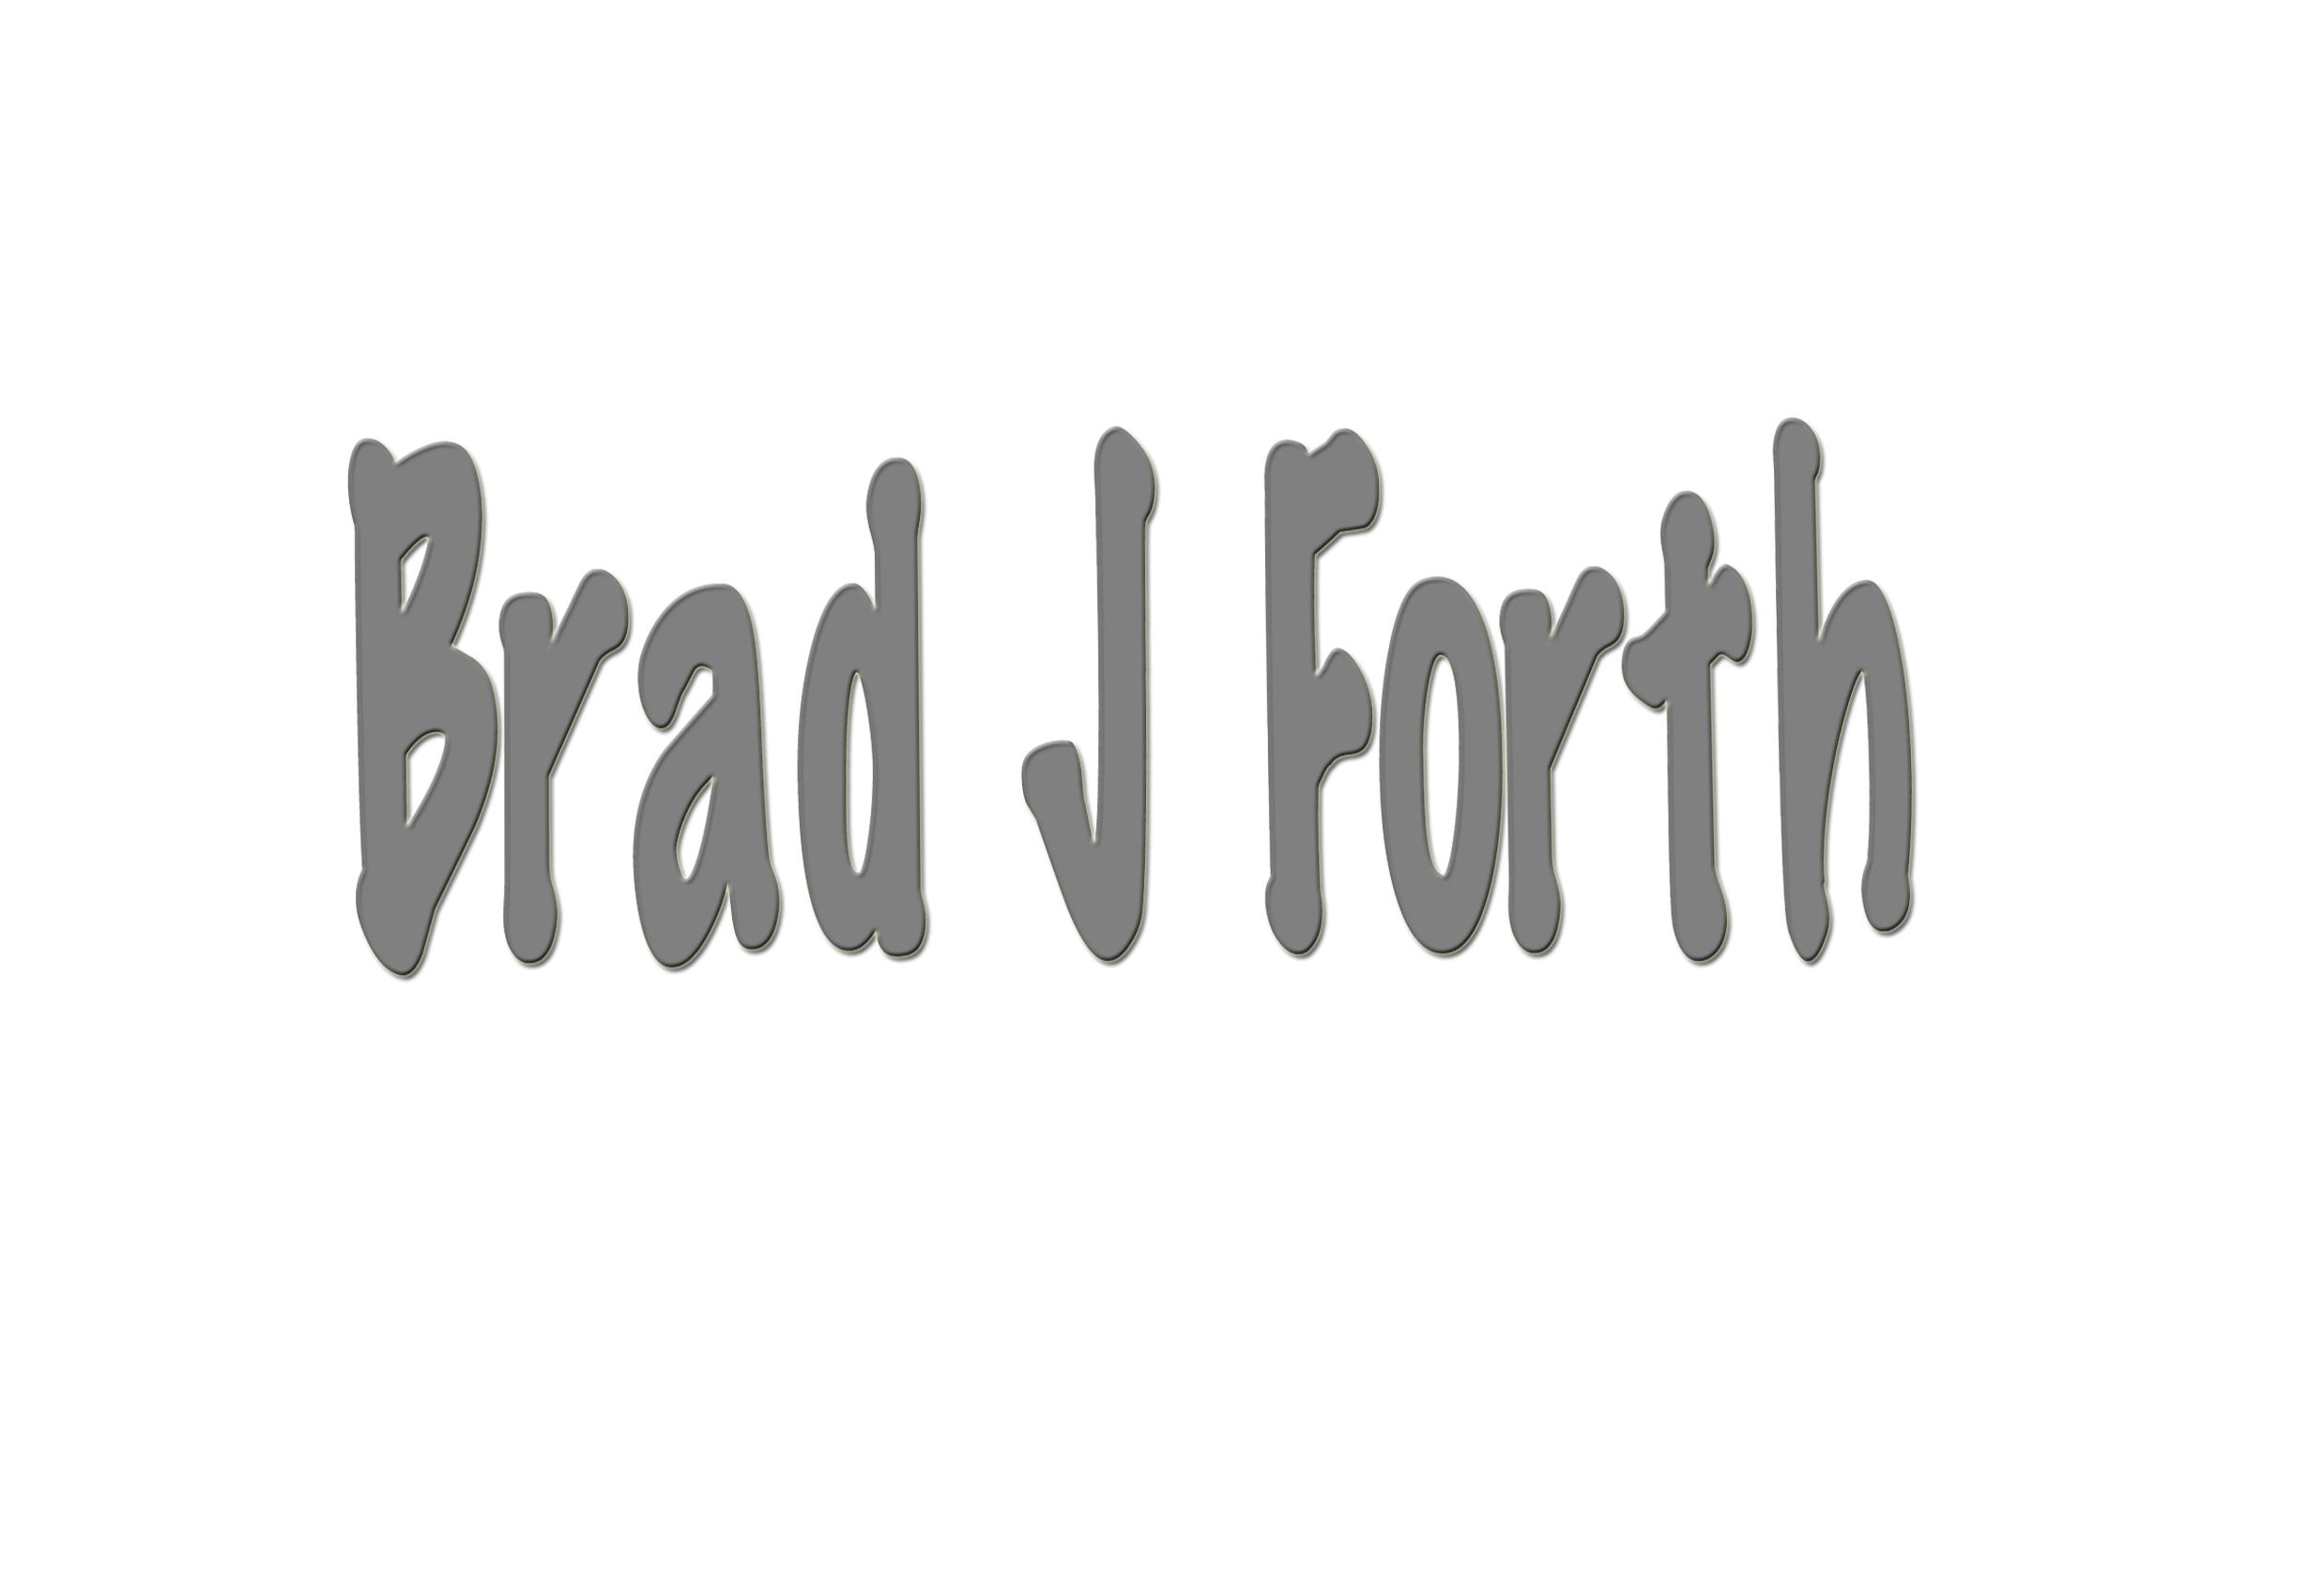 Brad Forth's Signature